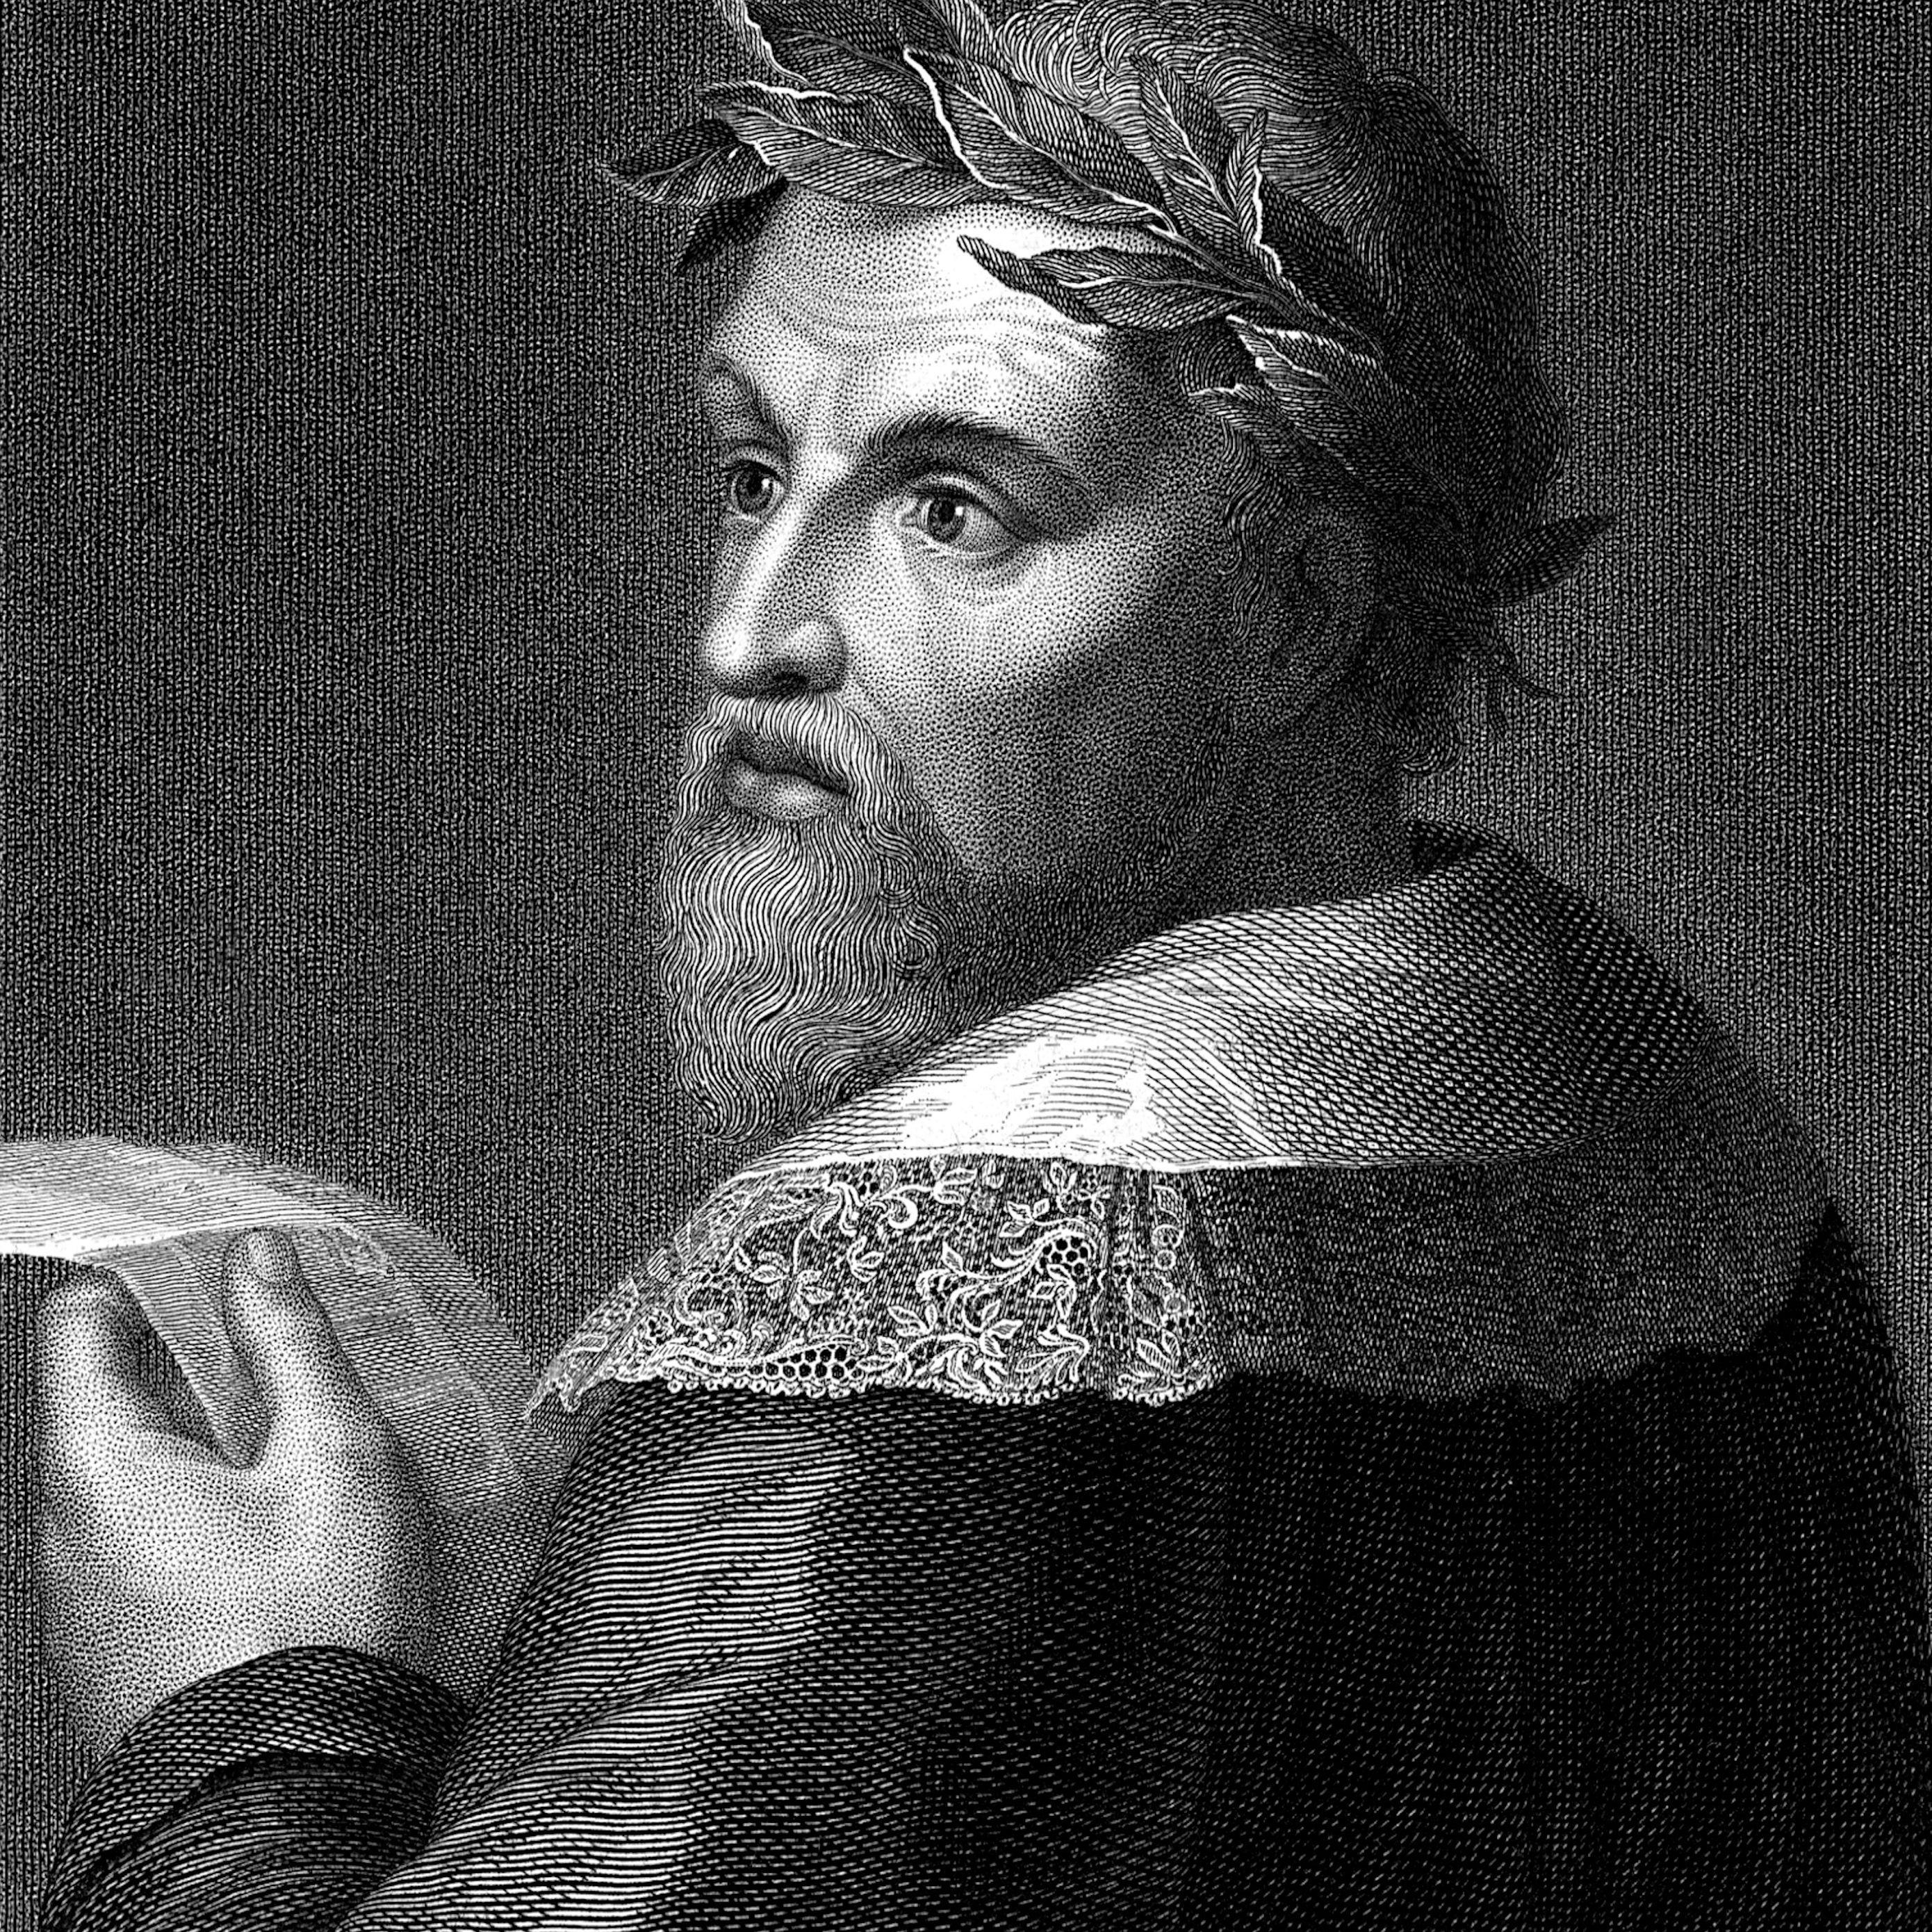 Engraved illustration of Ludovico Ariosto